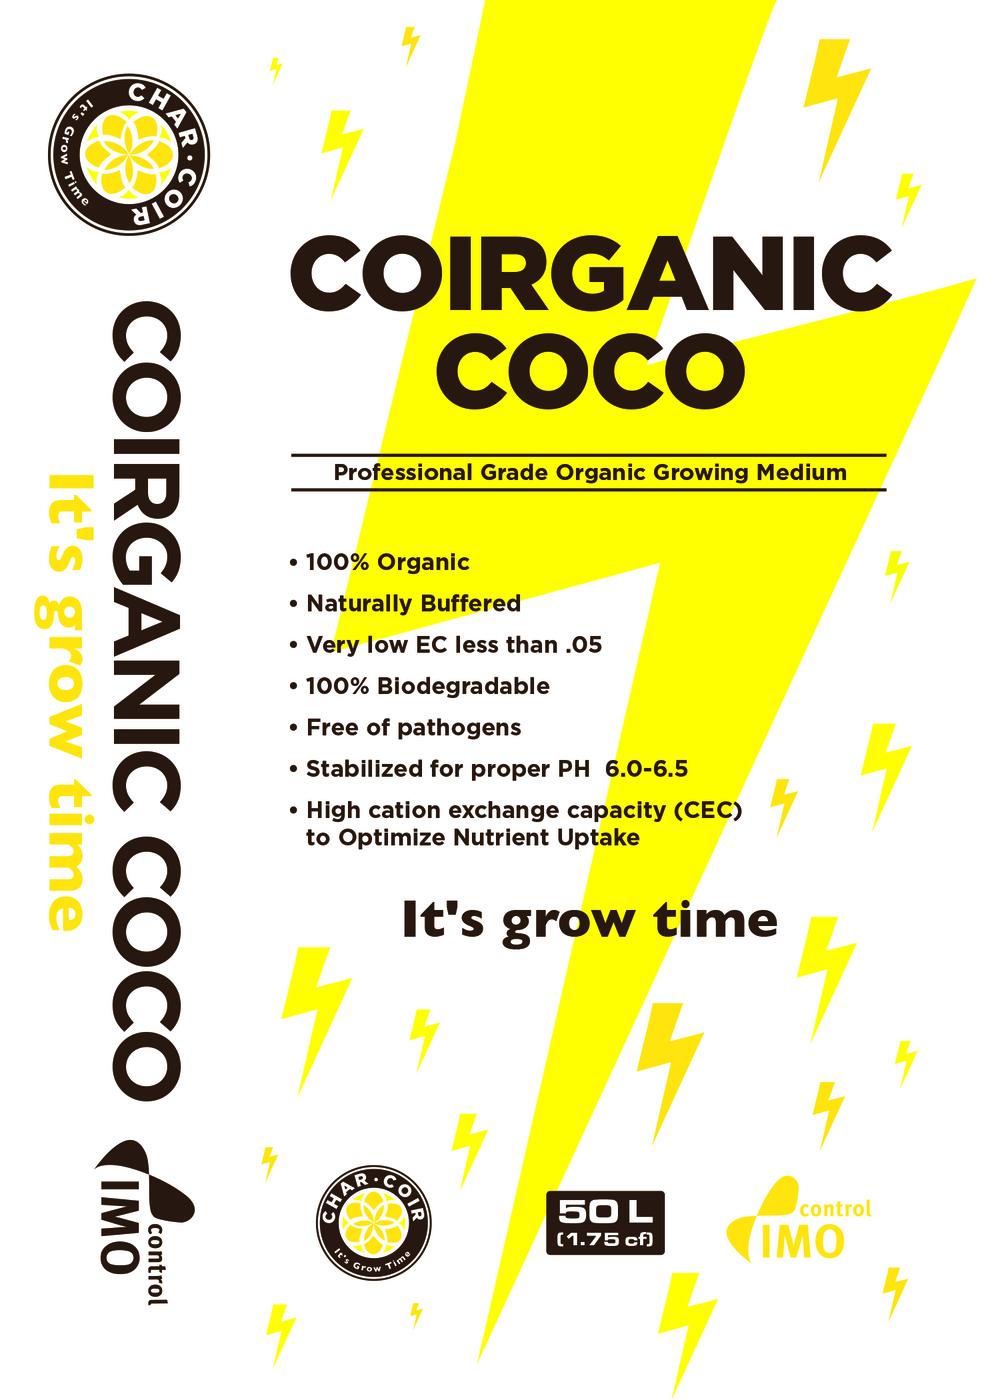 Coirganic Coco